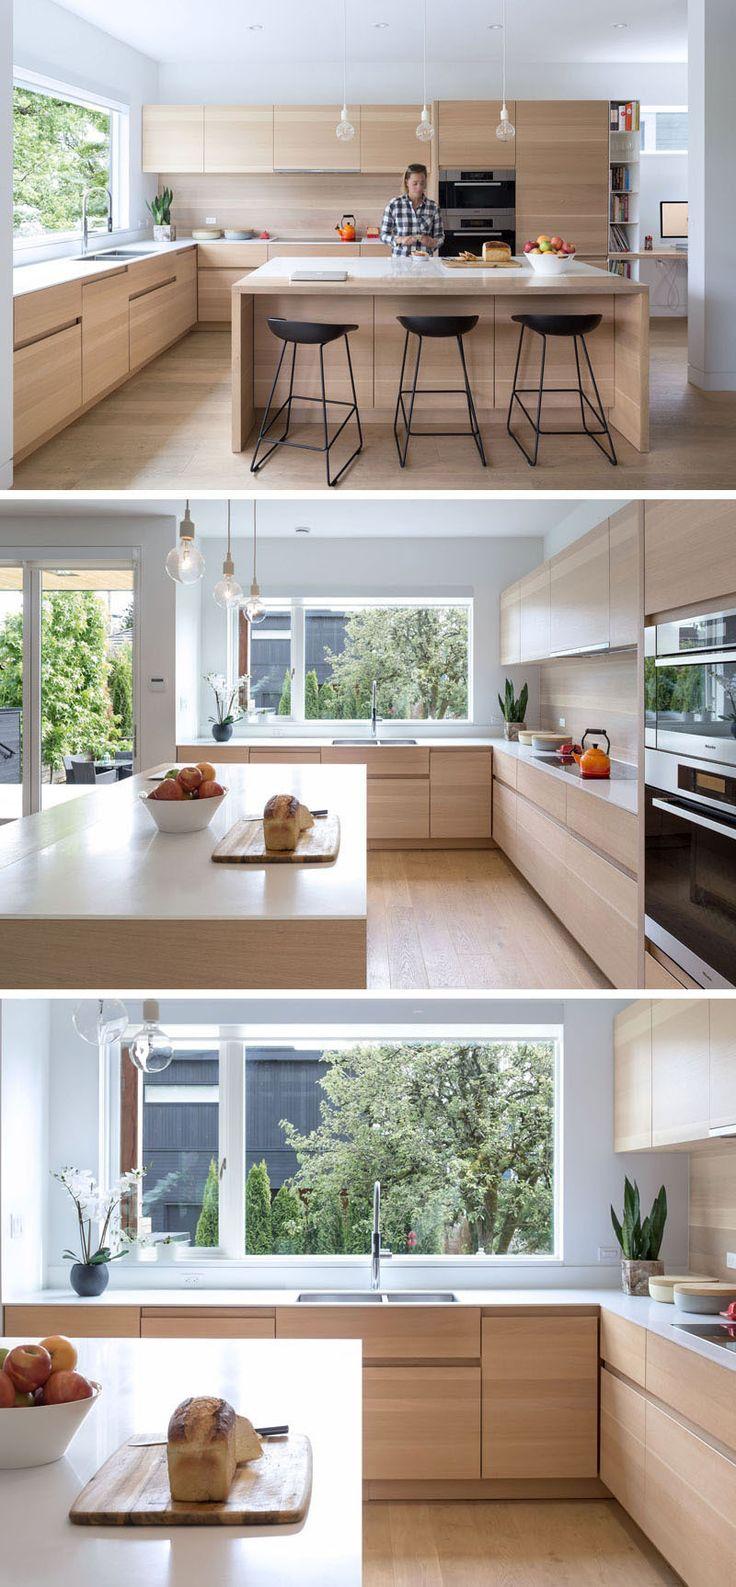 "remodelproj""big window bringing in natural light onto all"